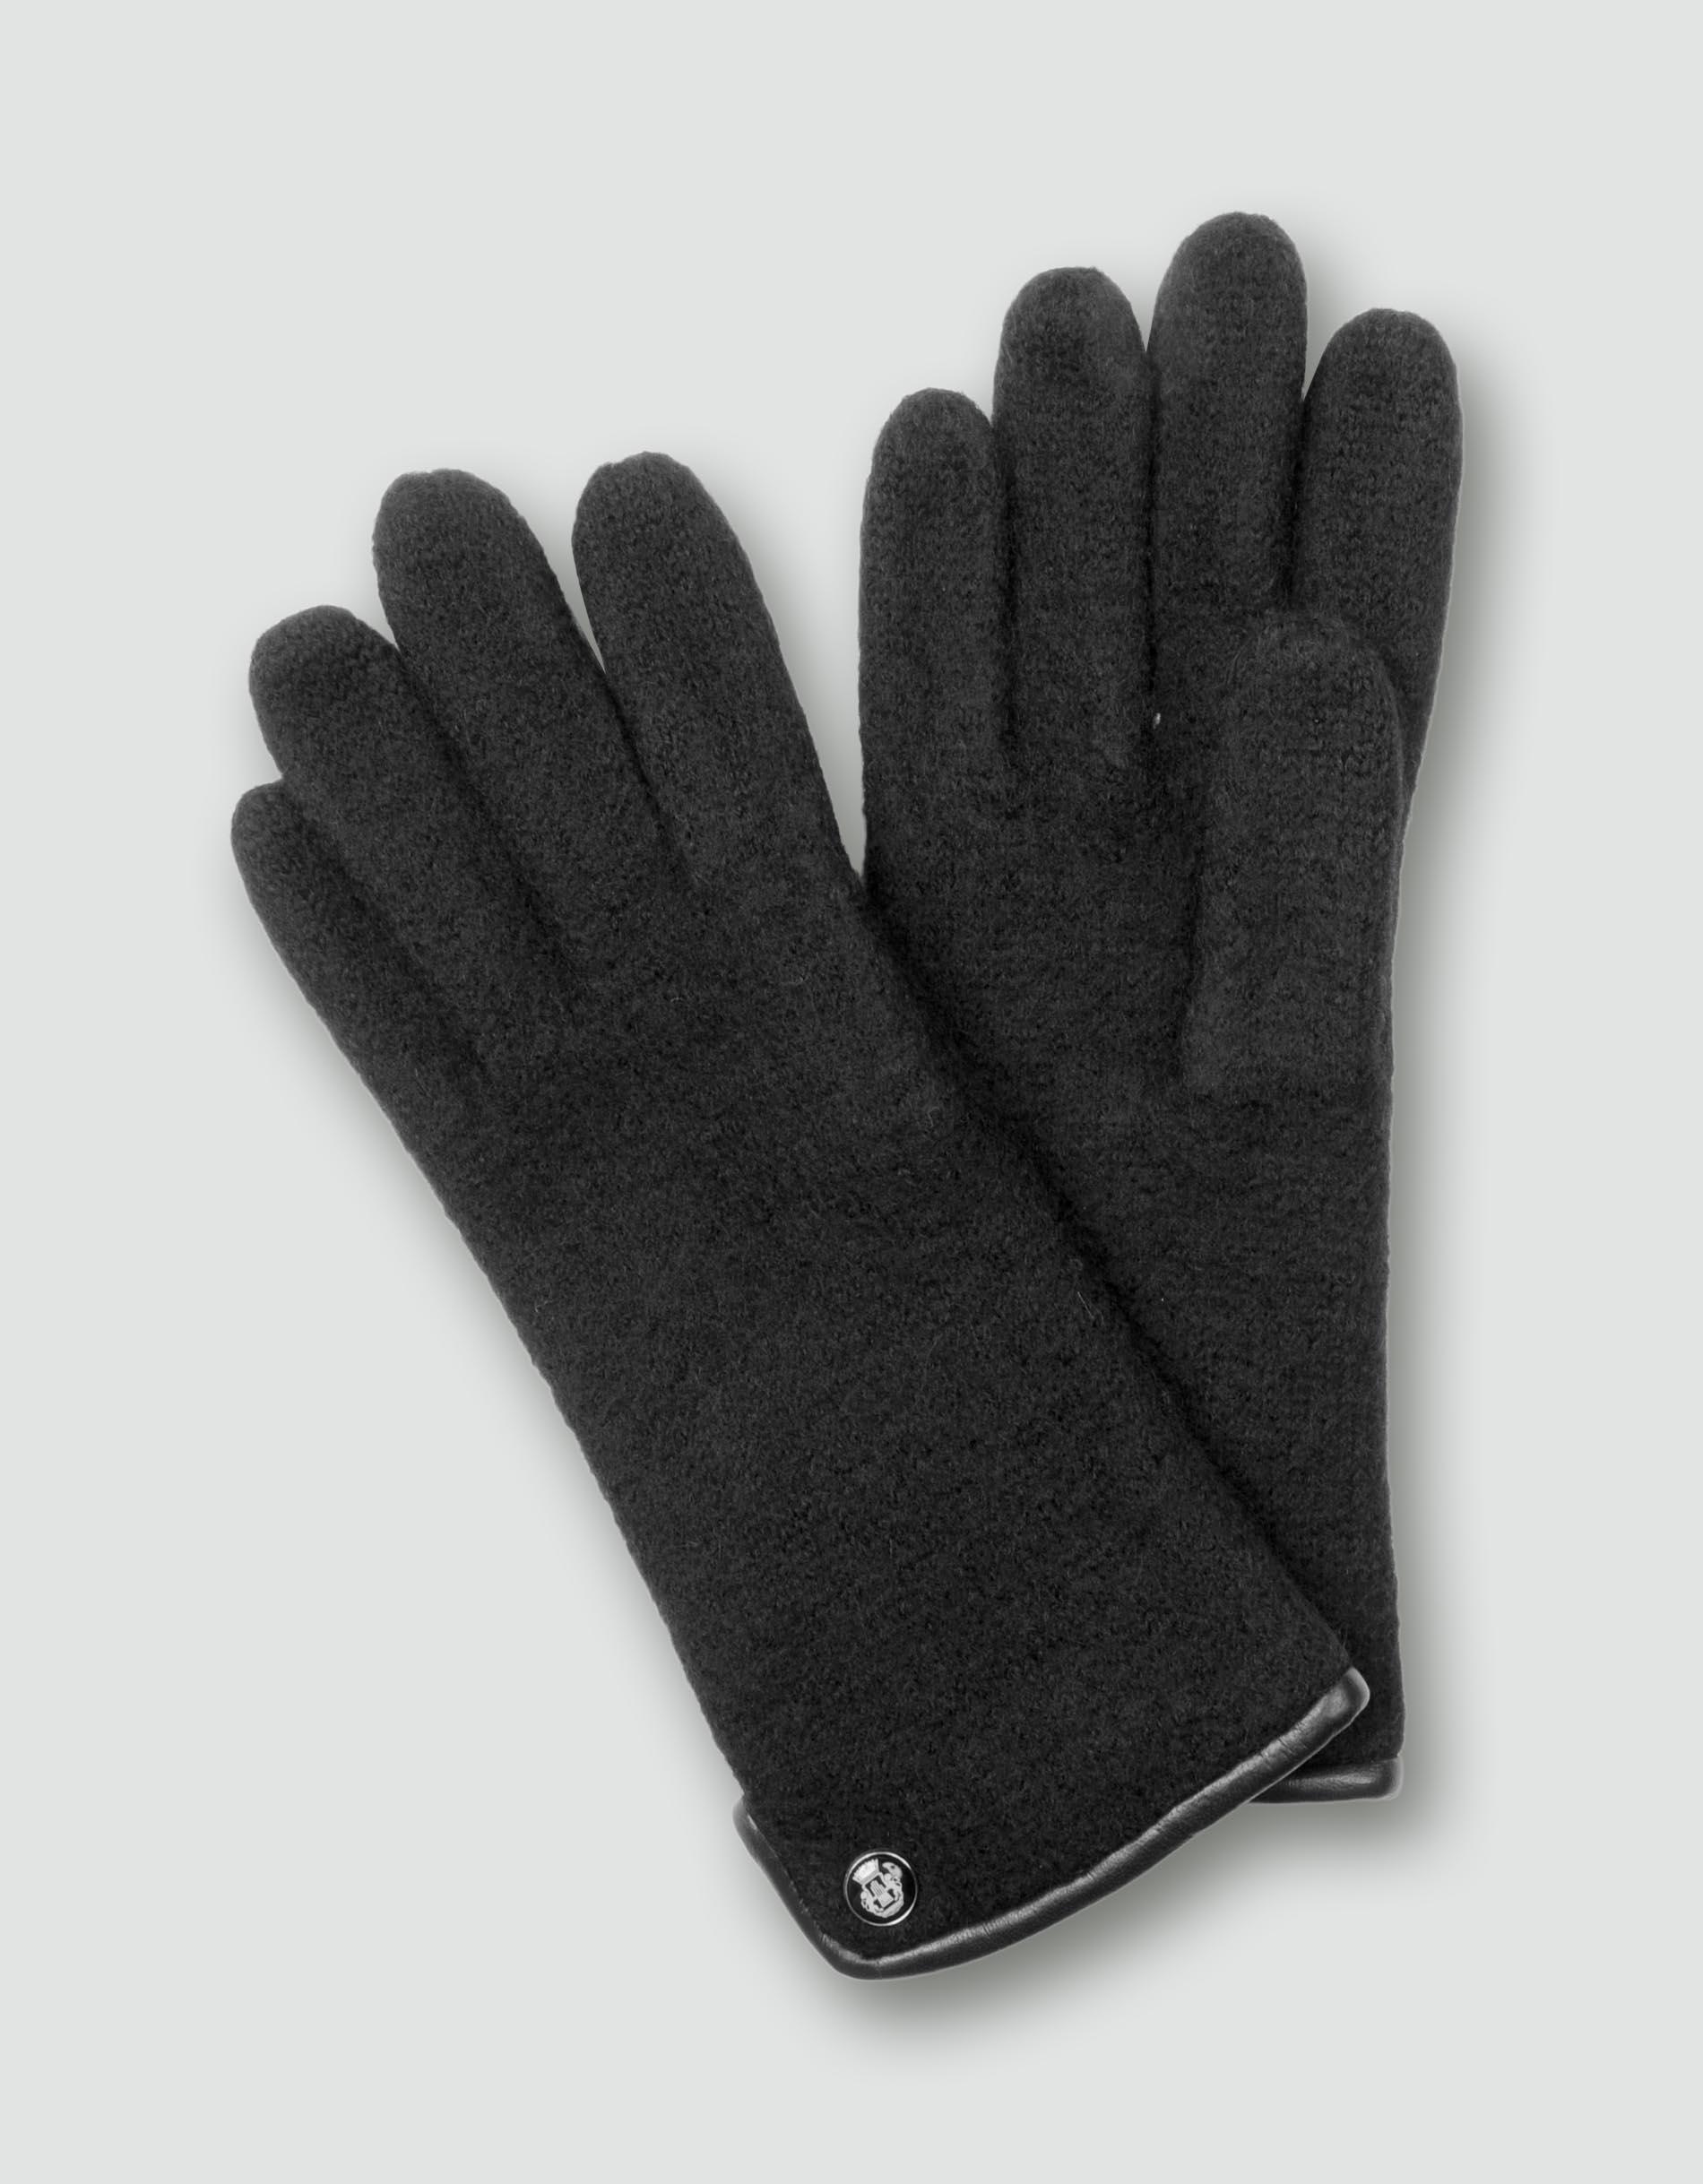 roeckl damen handschuhe walkhandschuh schwarz empfohlen. Black Bedroom Furniture Sets. Home Design Ideas